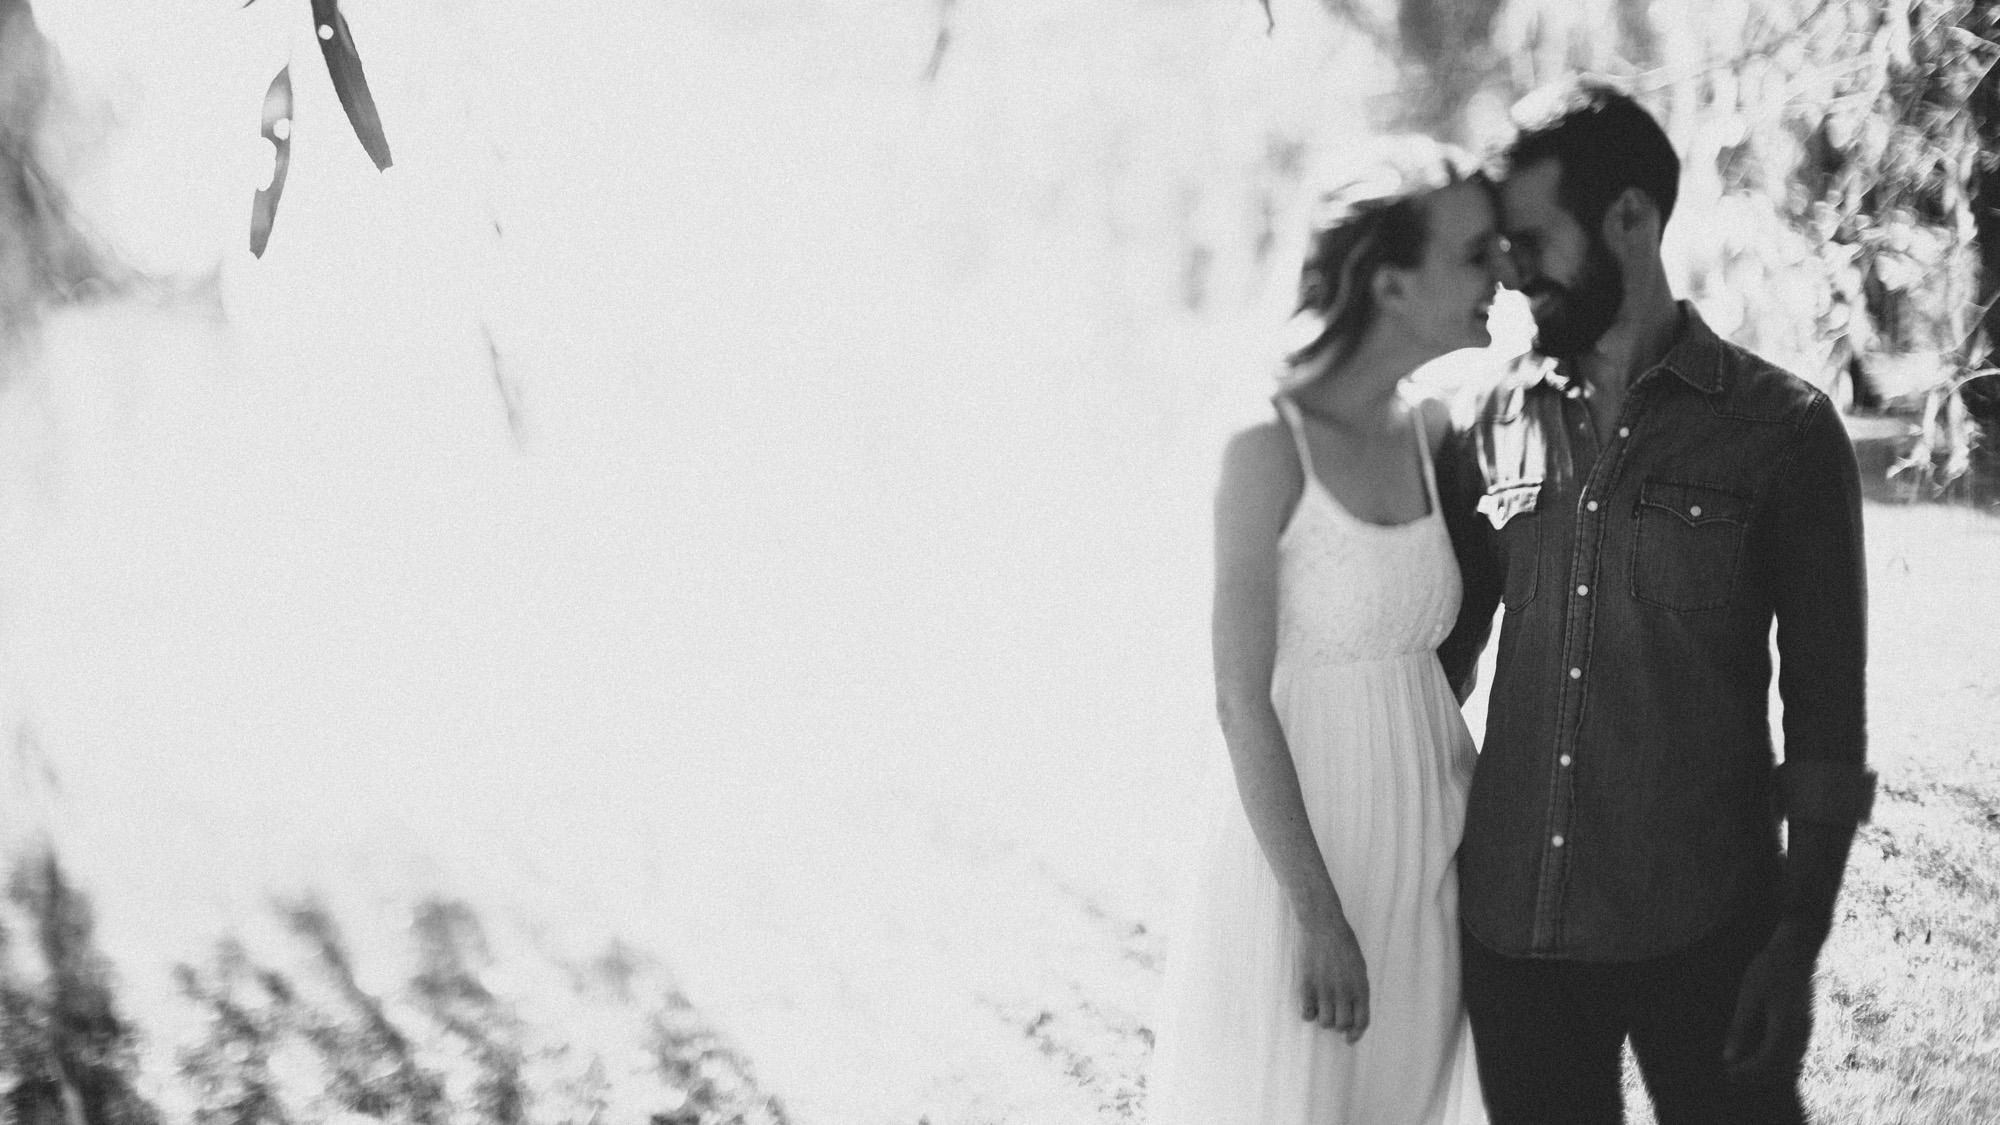 alec_vanderboom_springfield_missouri_wedding-0022.jpg